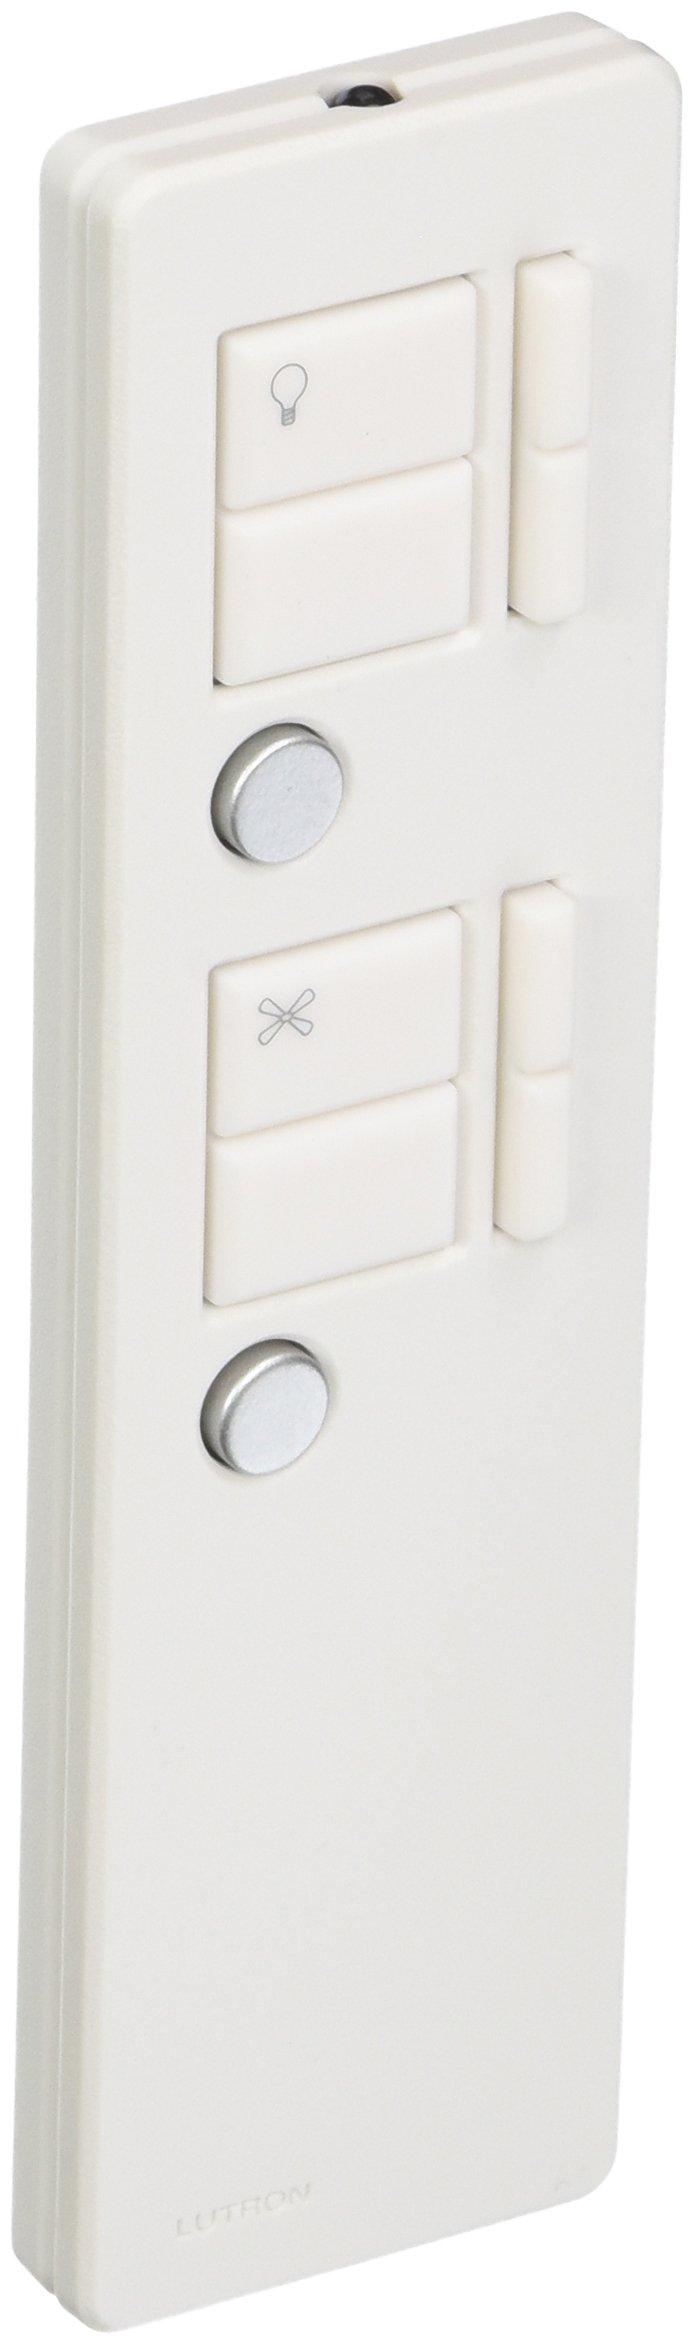 Lutron Electronics Co. MIR-ITFS-LF-WH Maestro IR Fan/Light Remote Control, White by Lutron (Image #1)